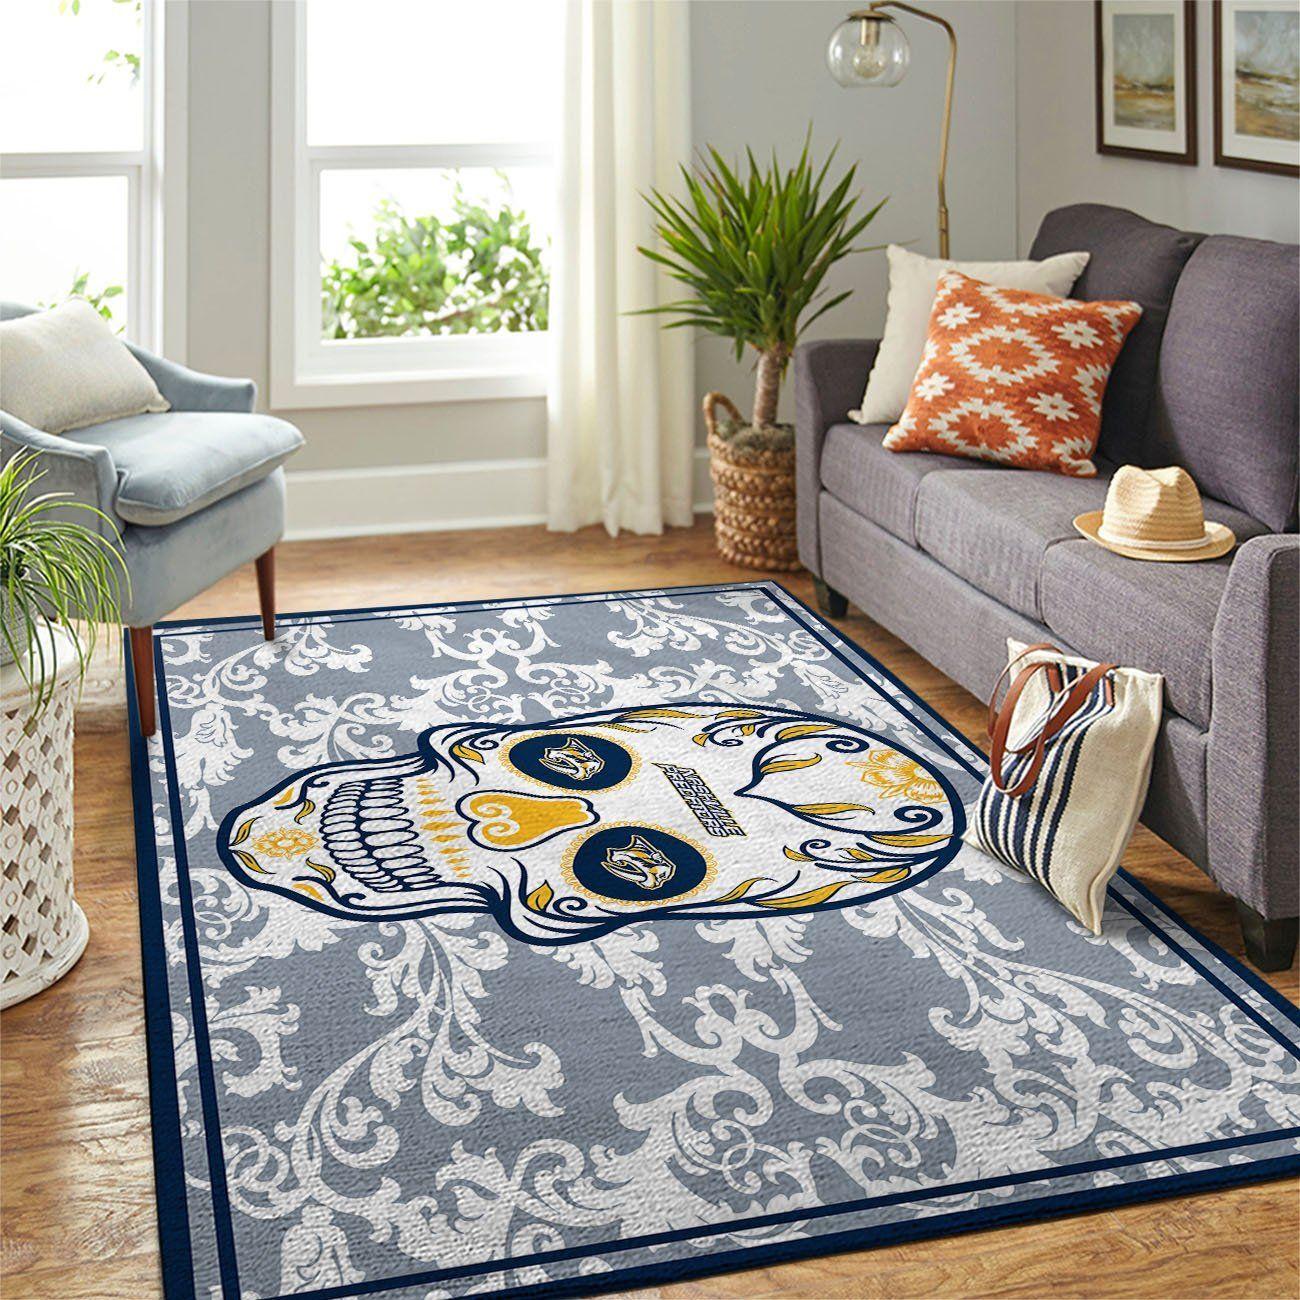 Amazon Nashville Predators Living Room Area No4007 Rug